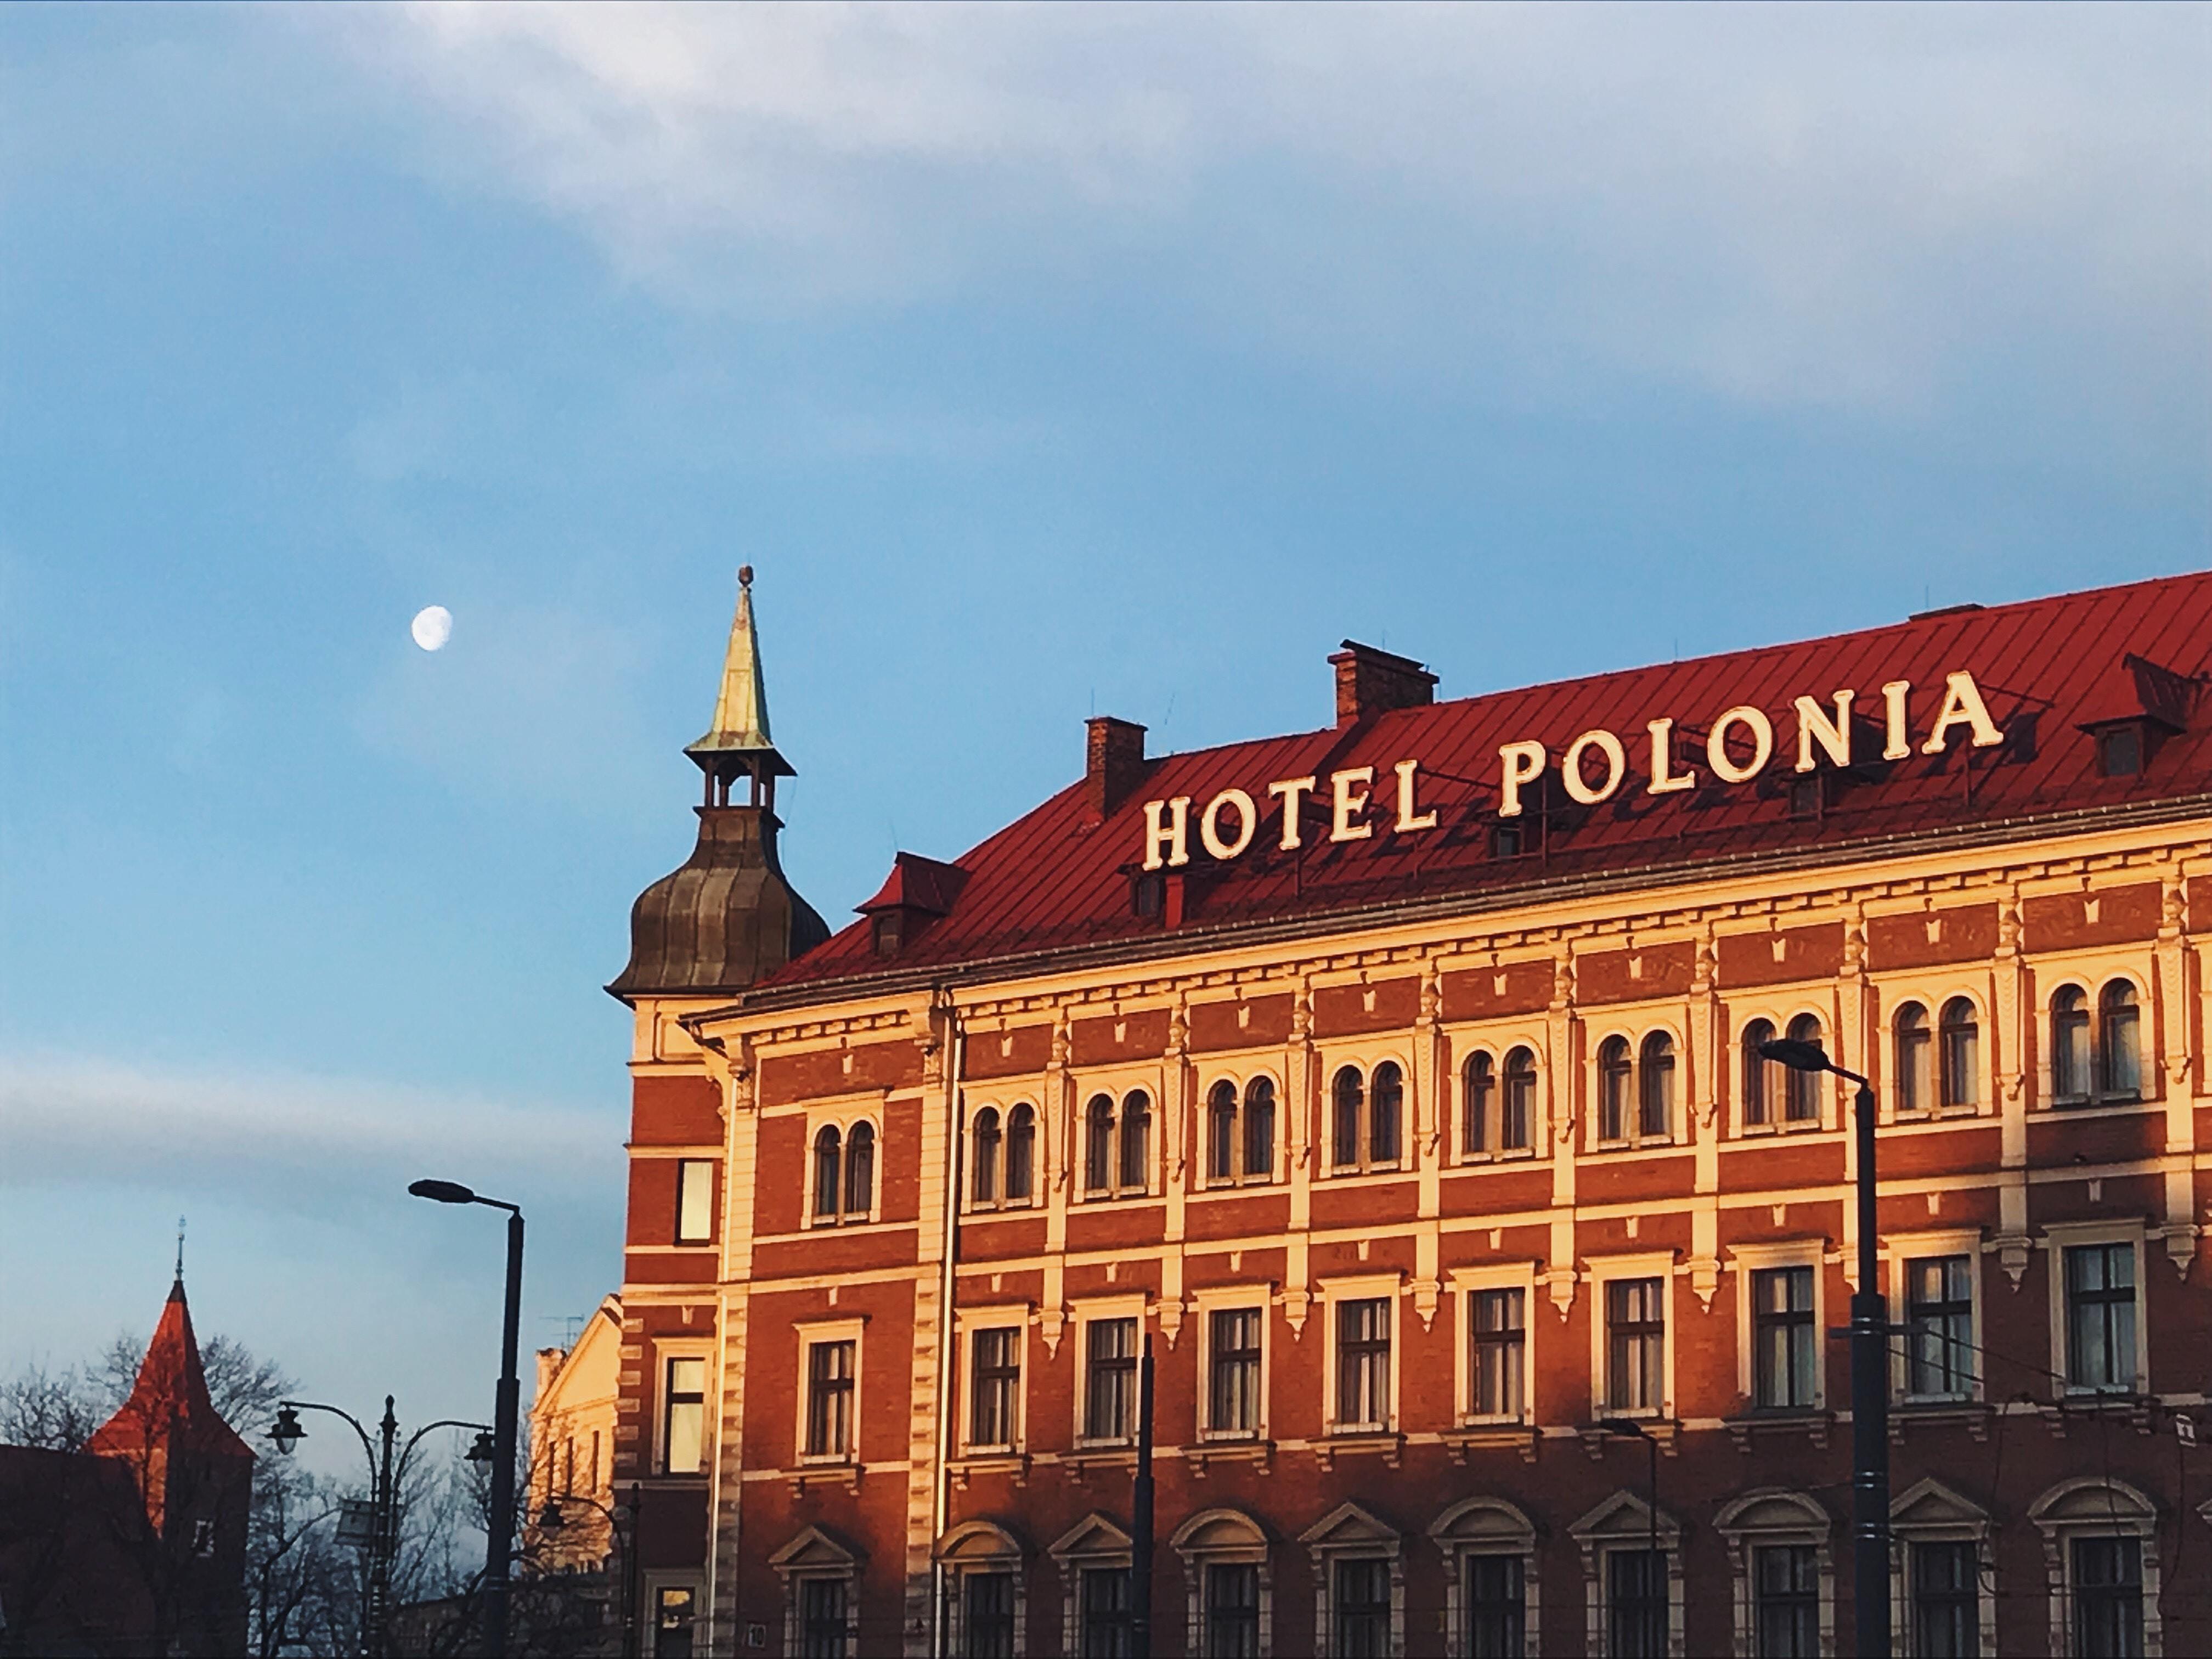 Hotel Polonia building